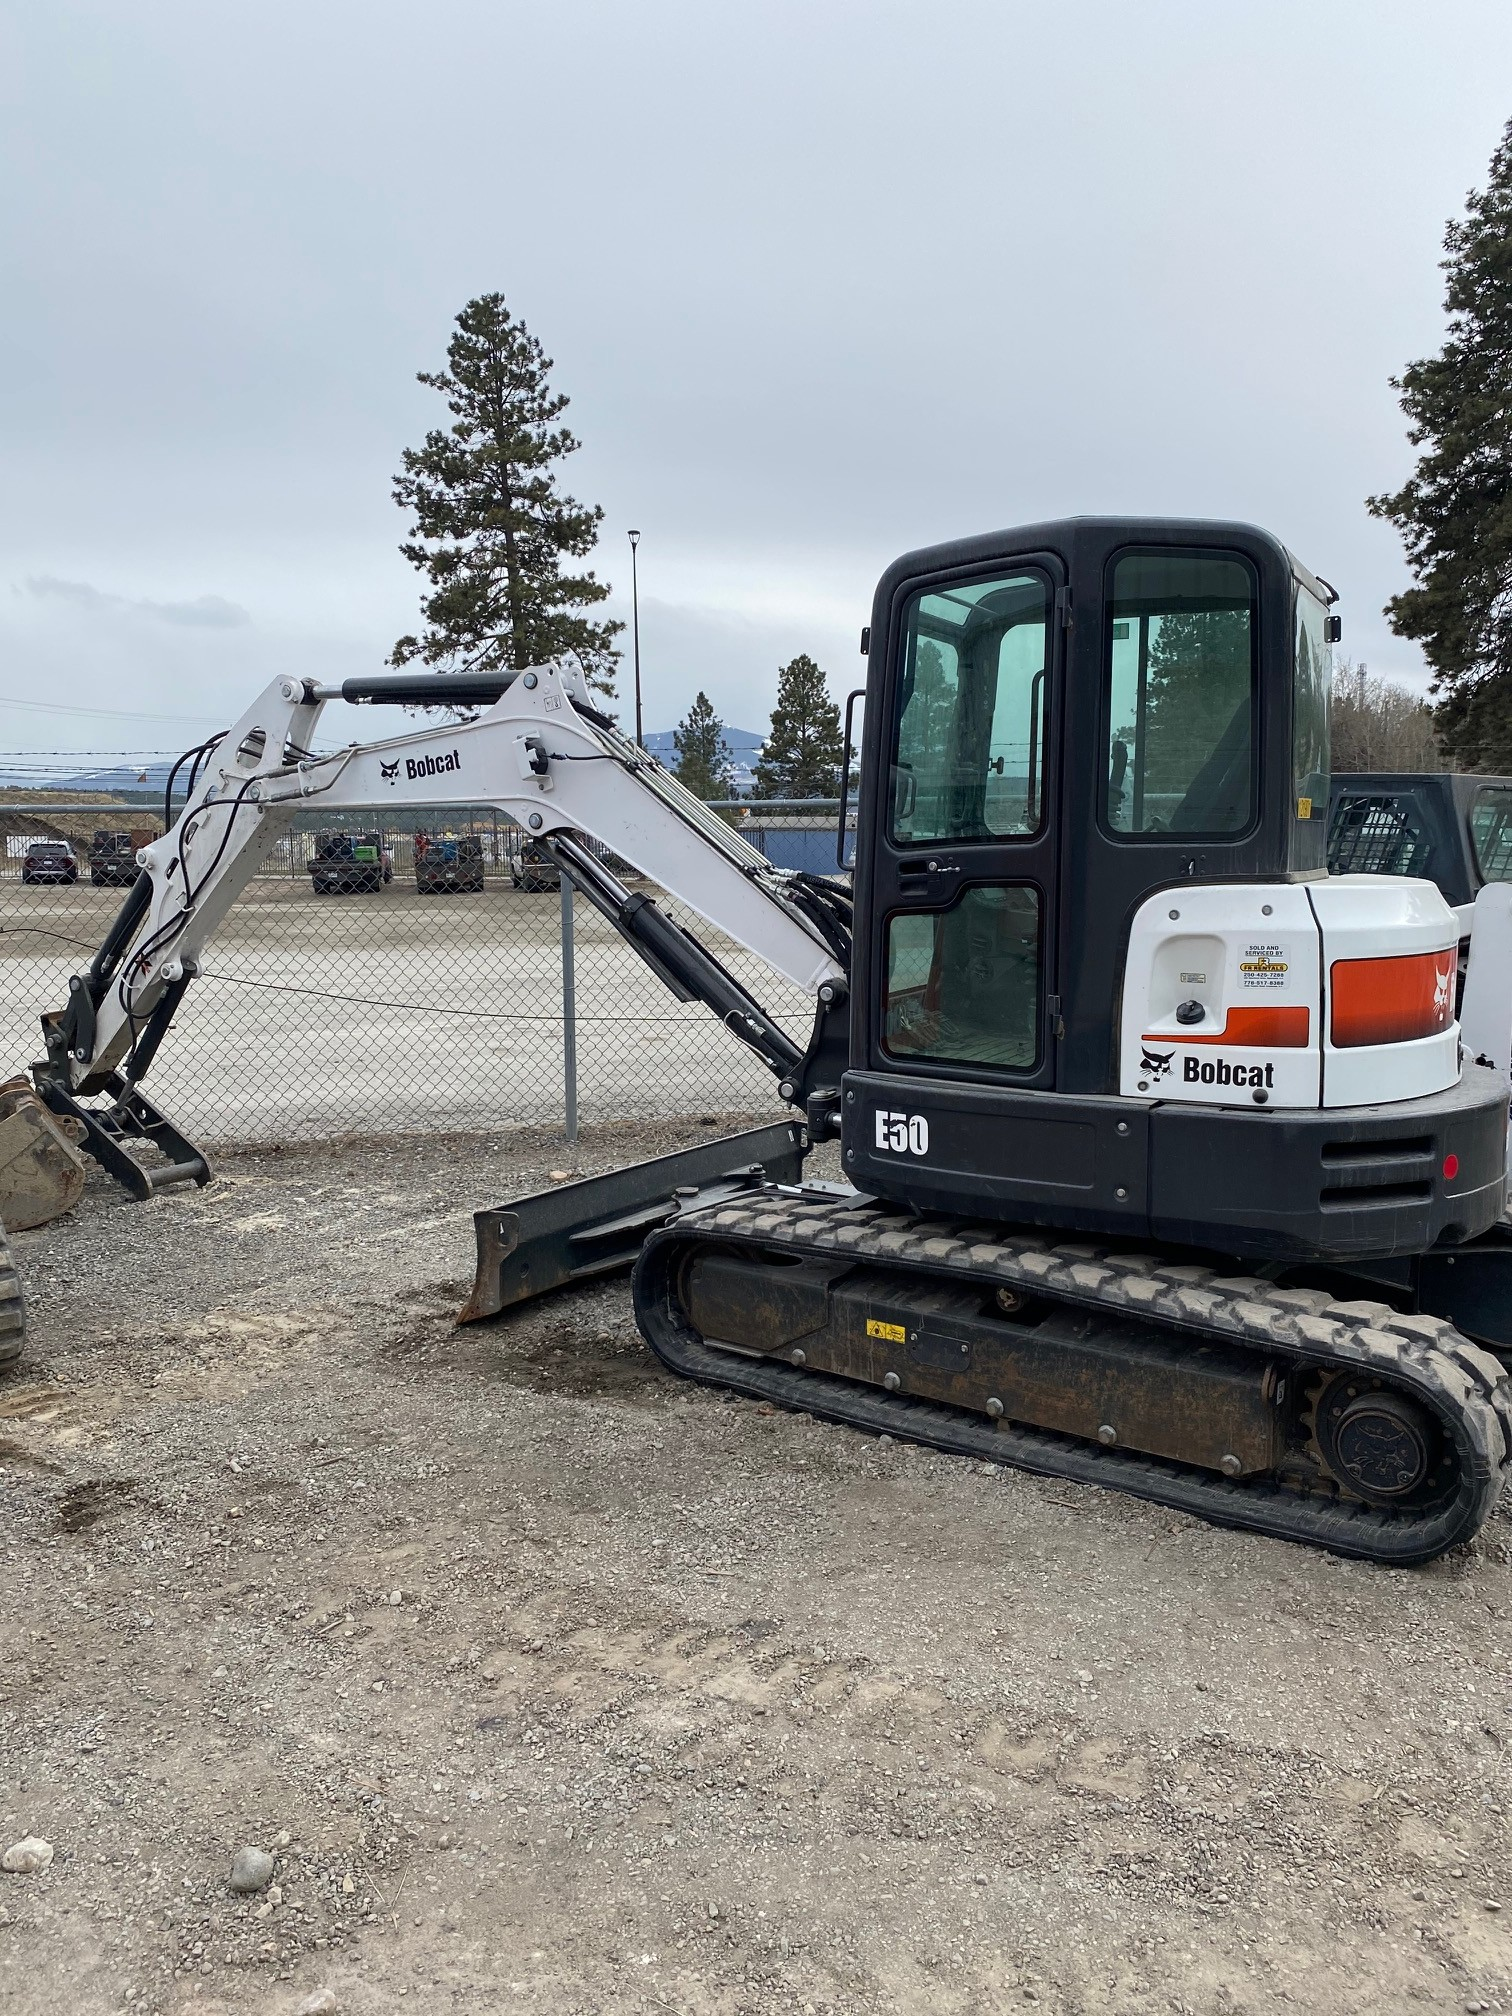 Used, 2019, Bobcat, E50, Excavators